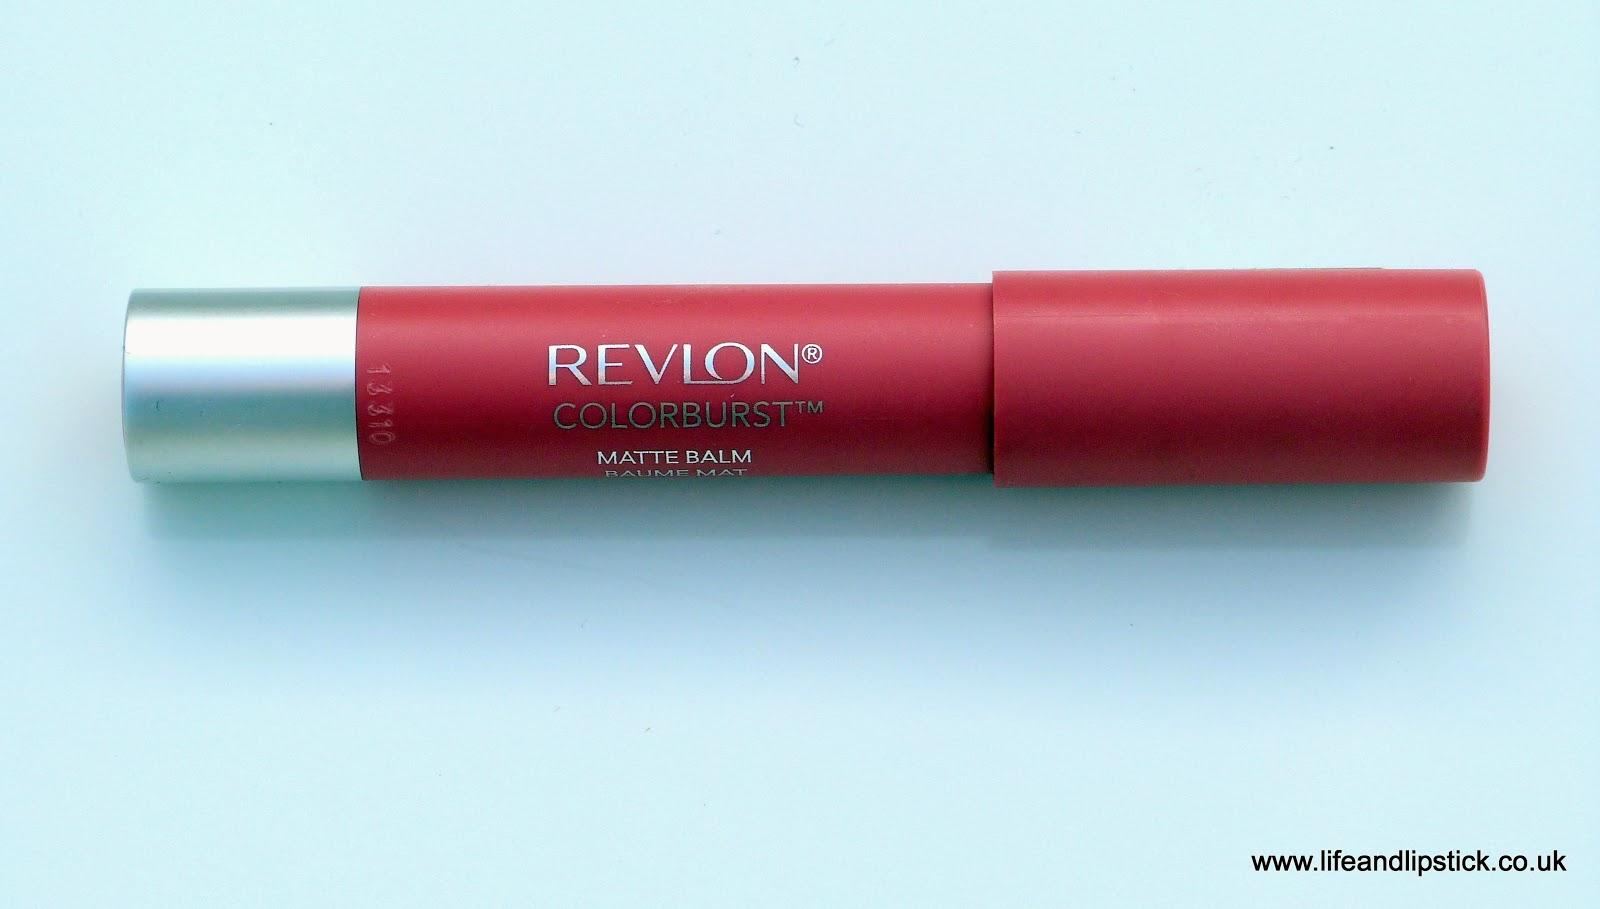 Revlon Colorburst Matte Balm in 205 Elusive